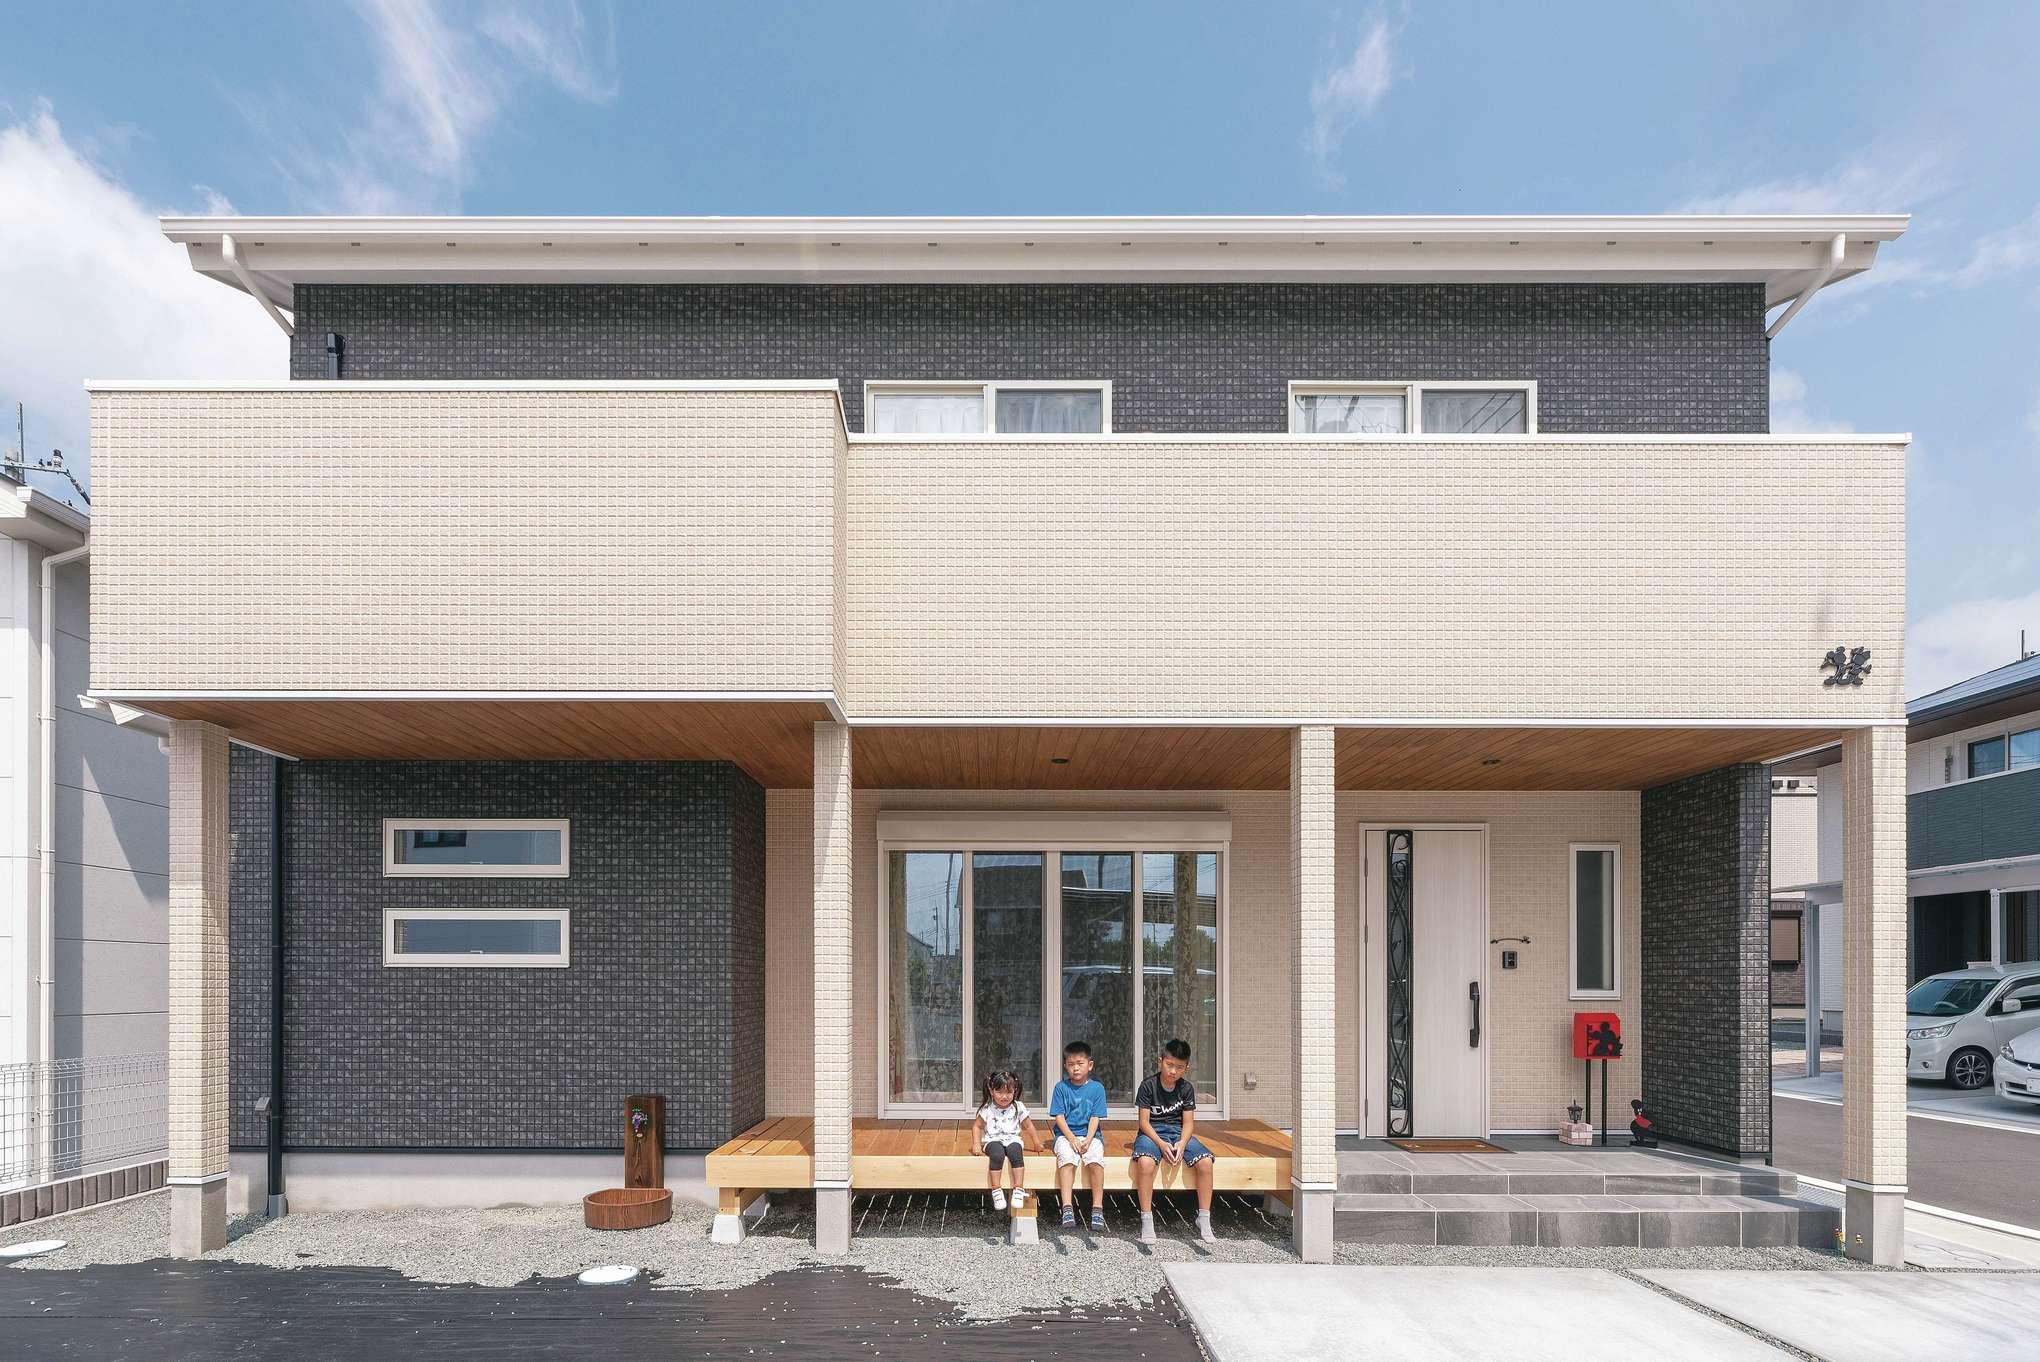 R+house沼津・伊東(HOUSE PLAN)【子育て、収納力、間取り】外観は黒をベースにクリームカラーを合わせた